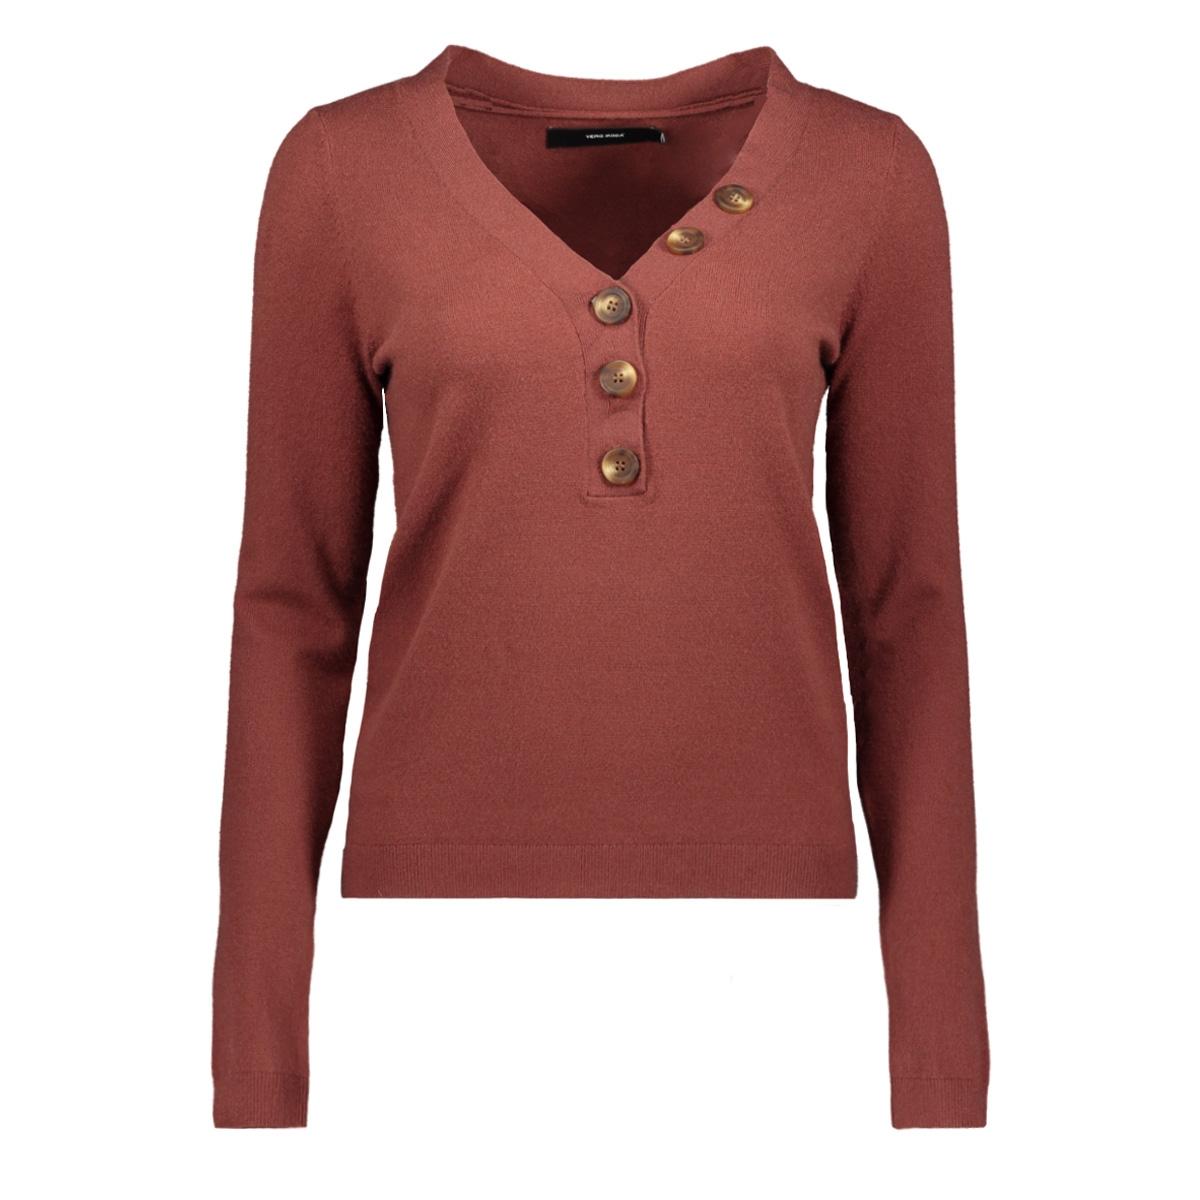 vmchip karis ls v-neck button blous 10215761 vero moda trui mahogany